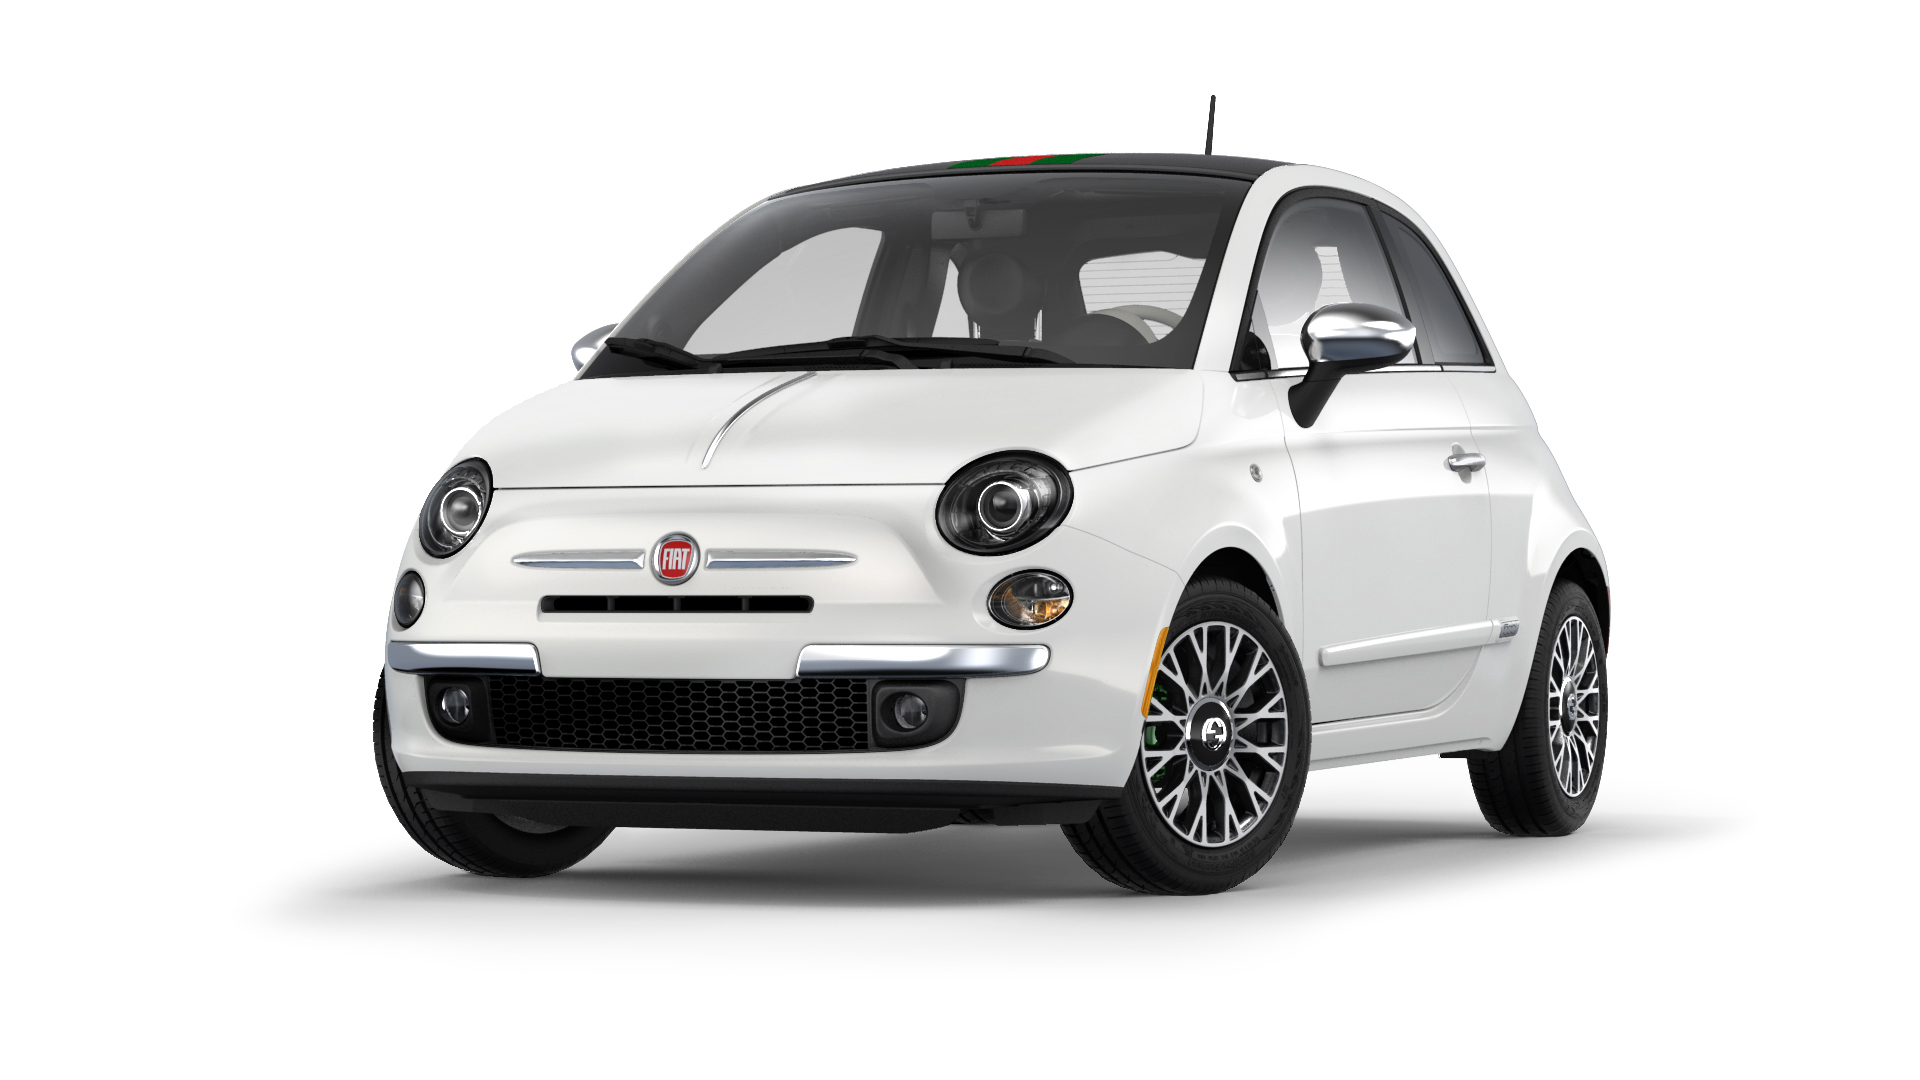 2013 FIAT 500c - Price, Photos, Reviews & Features